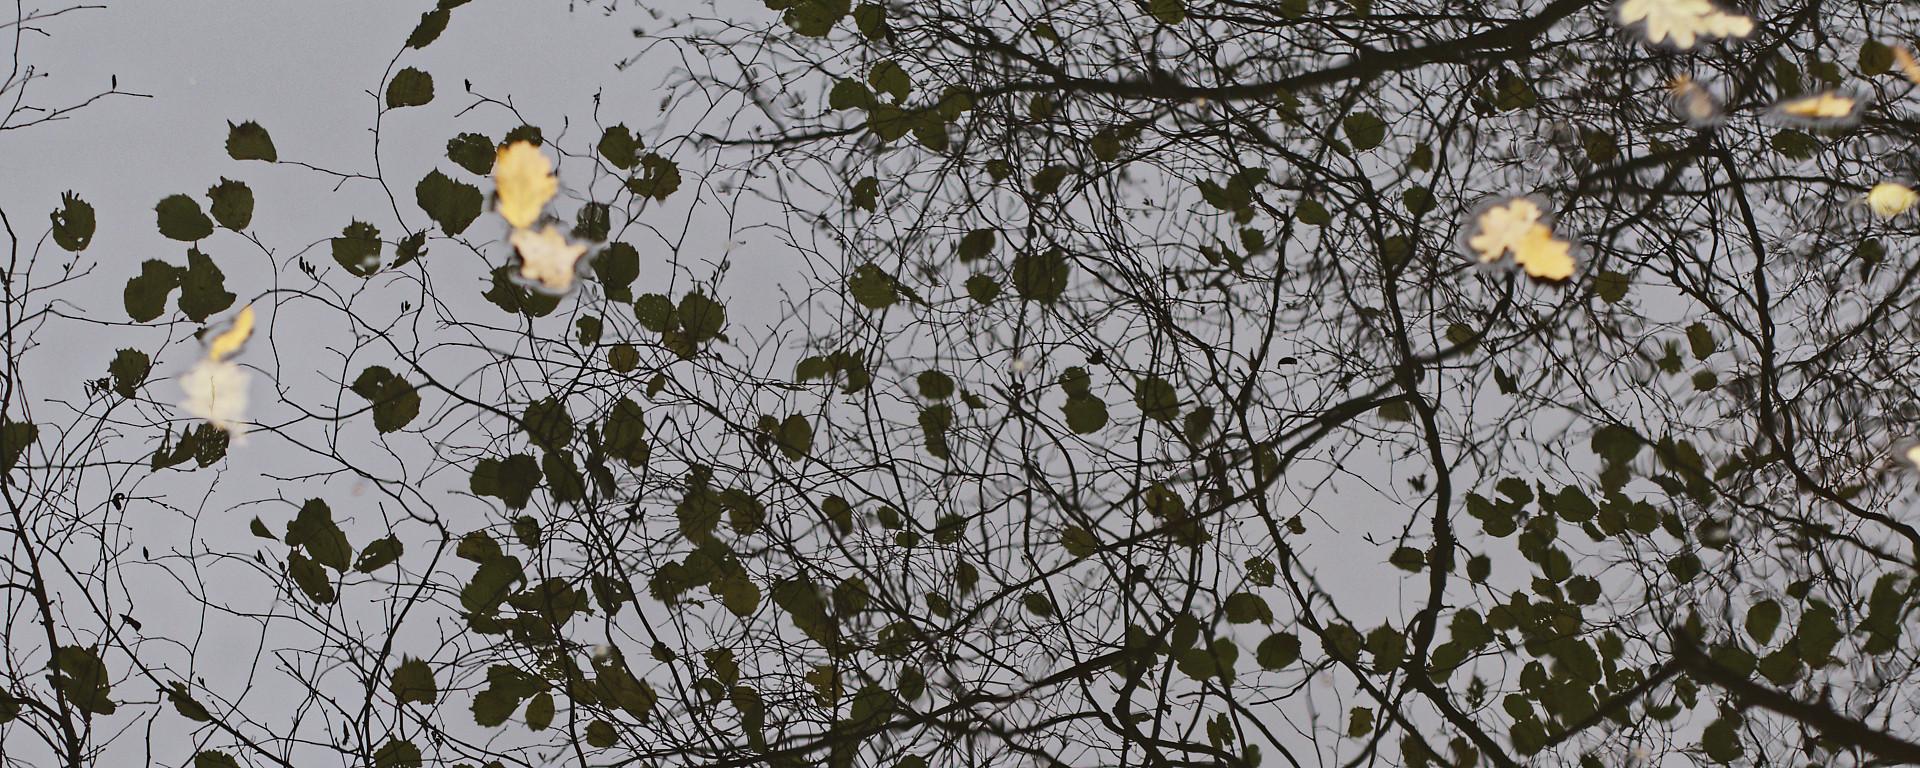 takken en bladeren gespiegeld in water